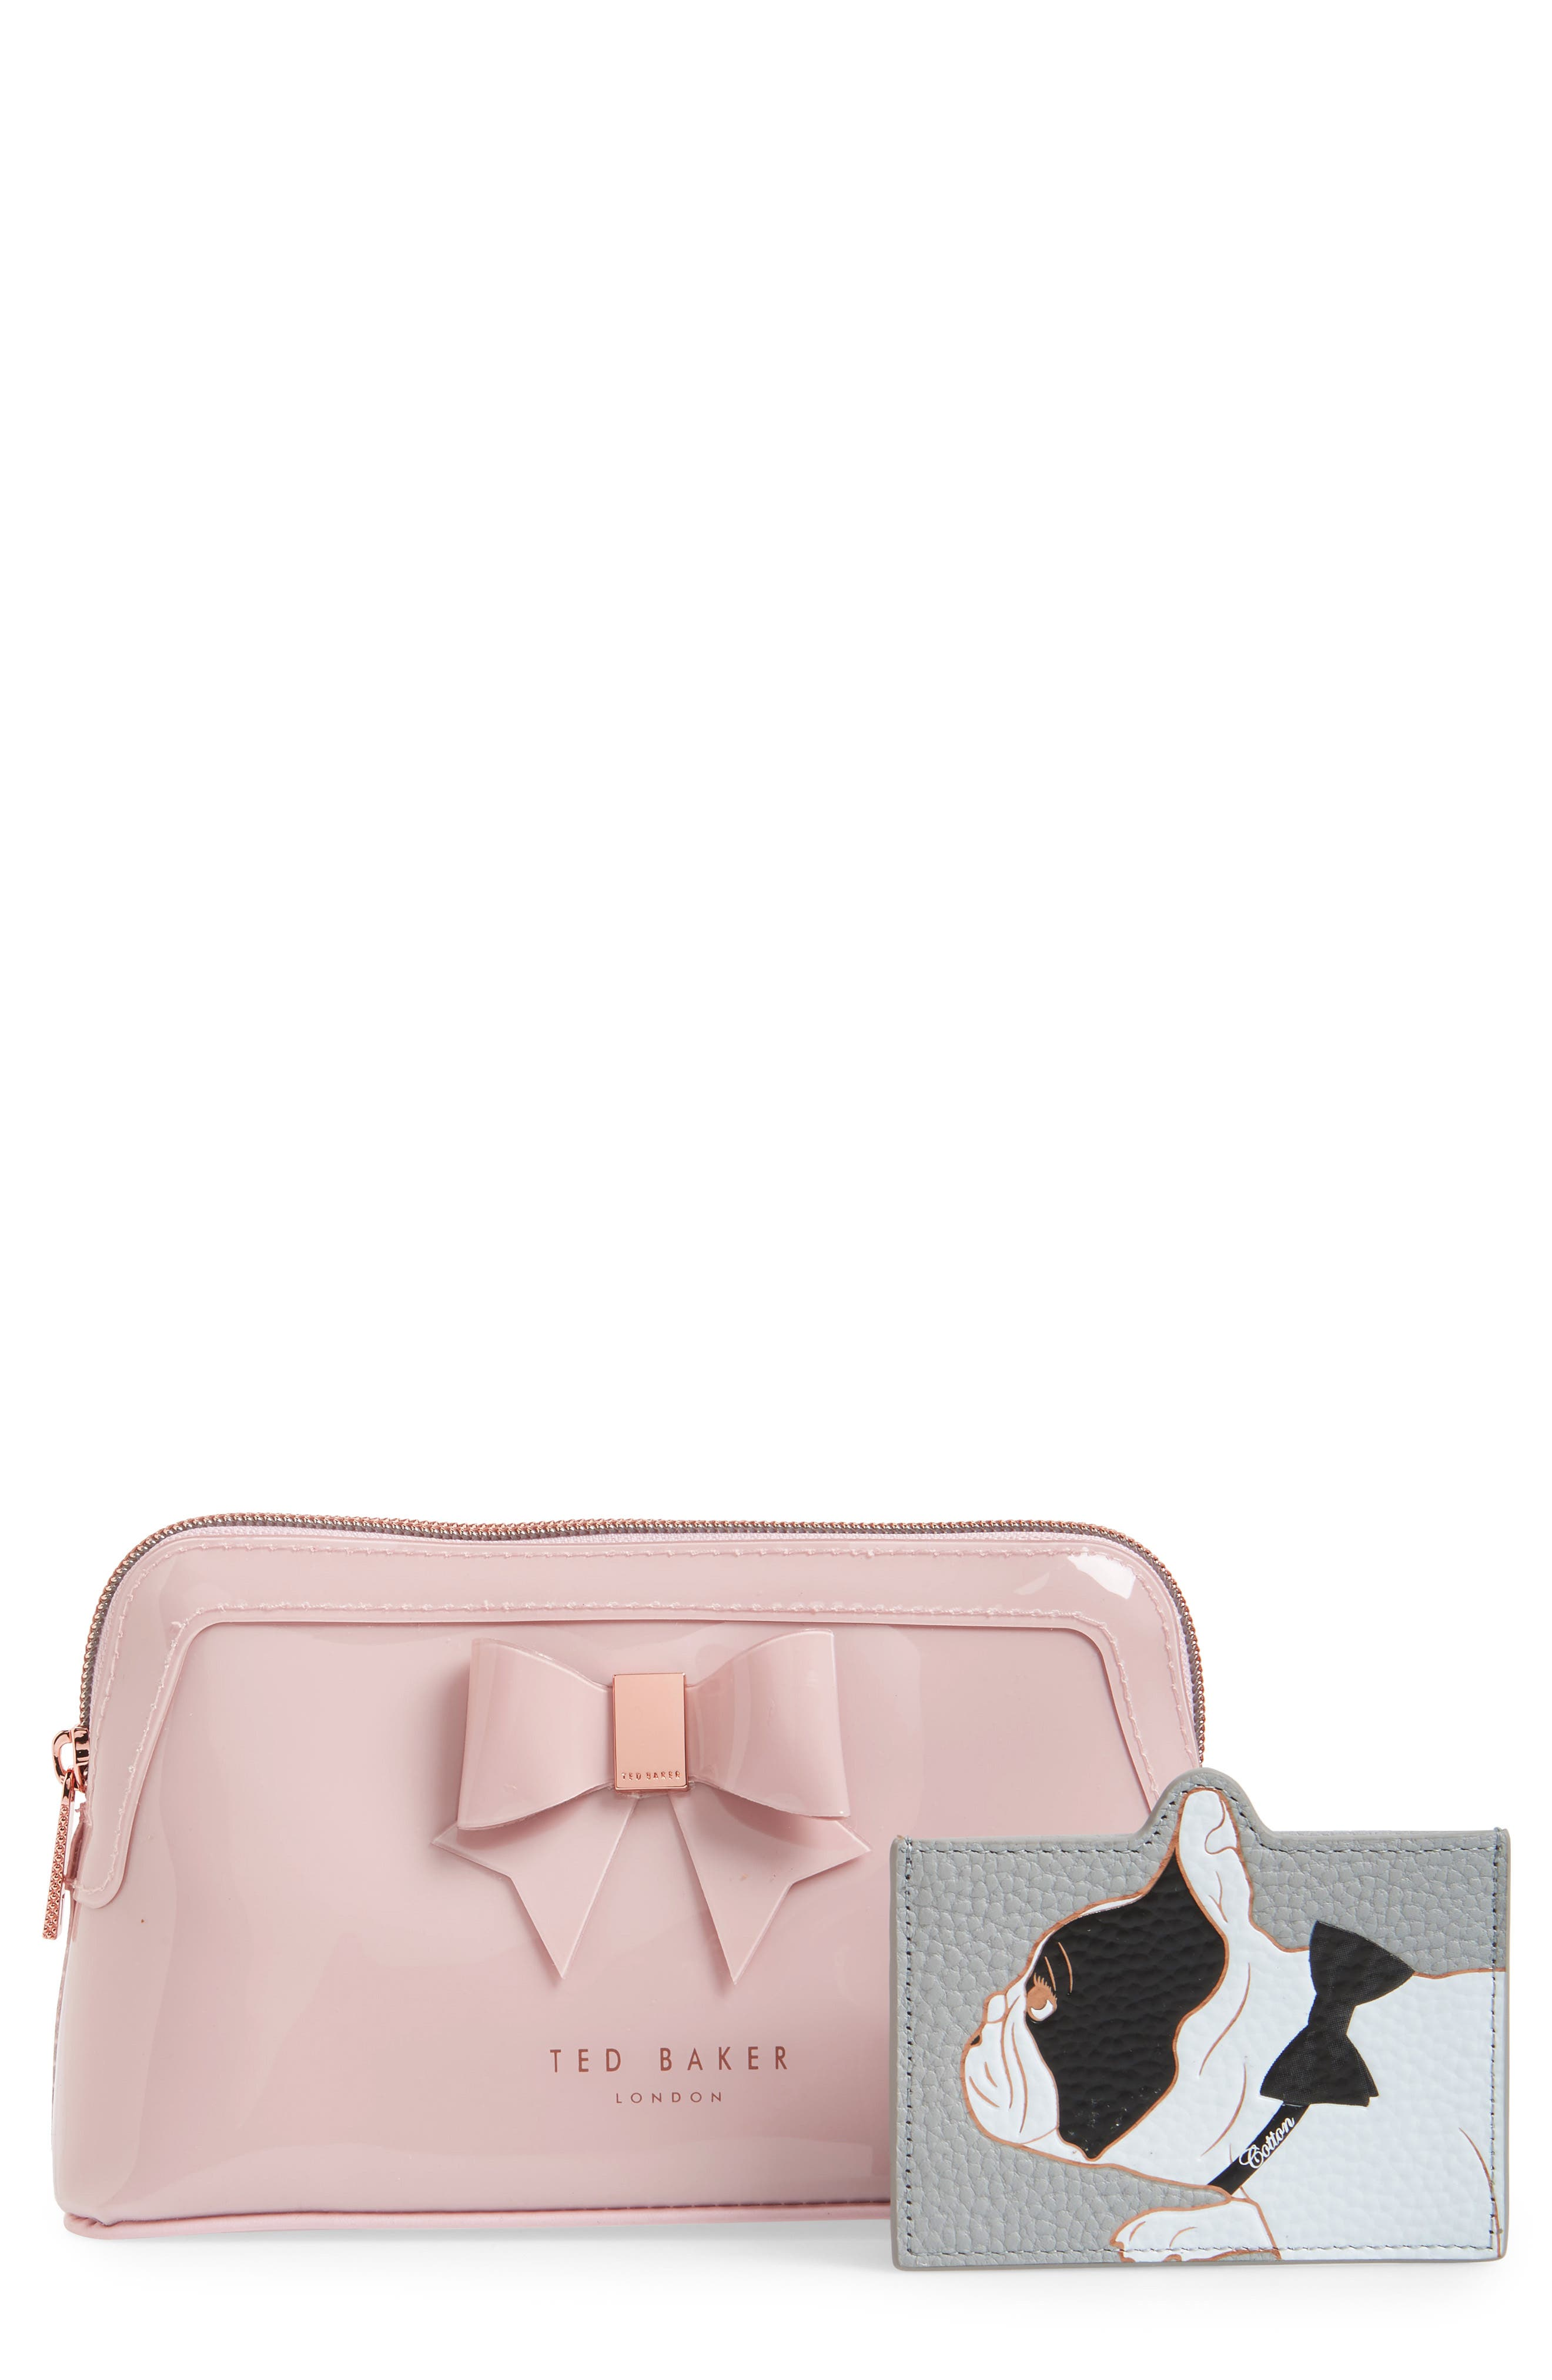 Celest Cosmetics Case & Cardholder Set, Main, color, GREY